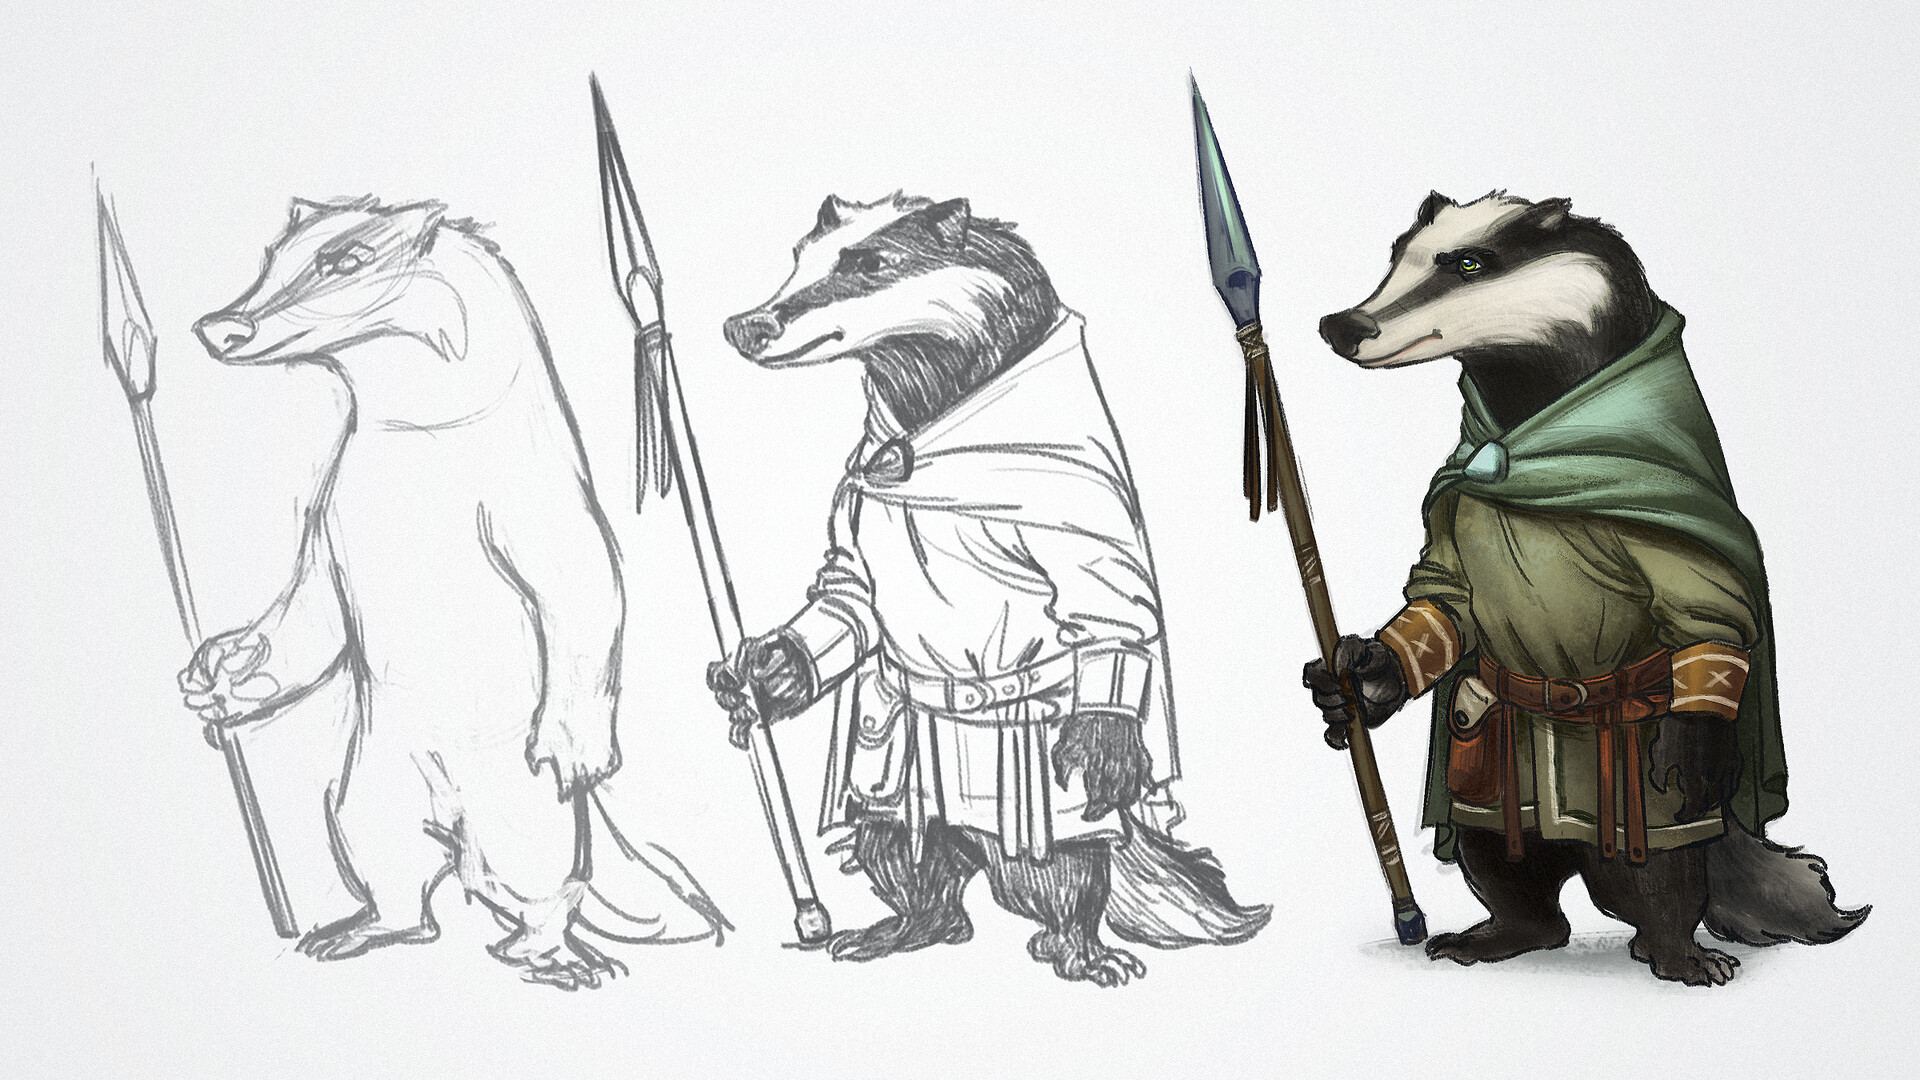 Guilherme freitas badger